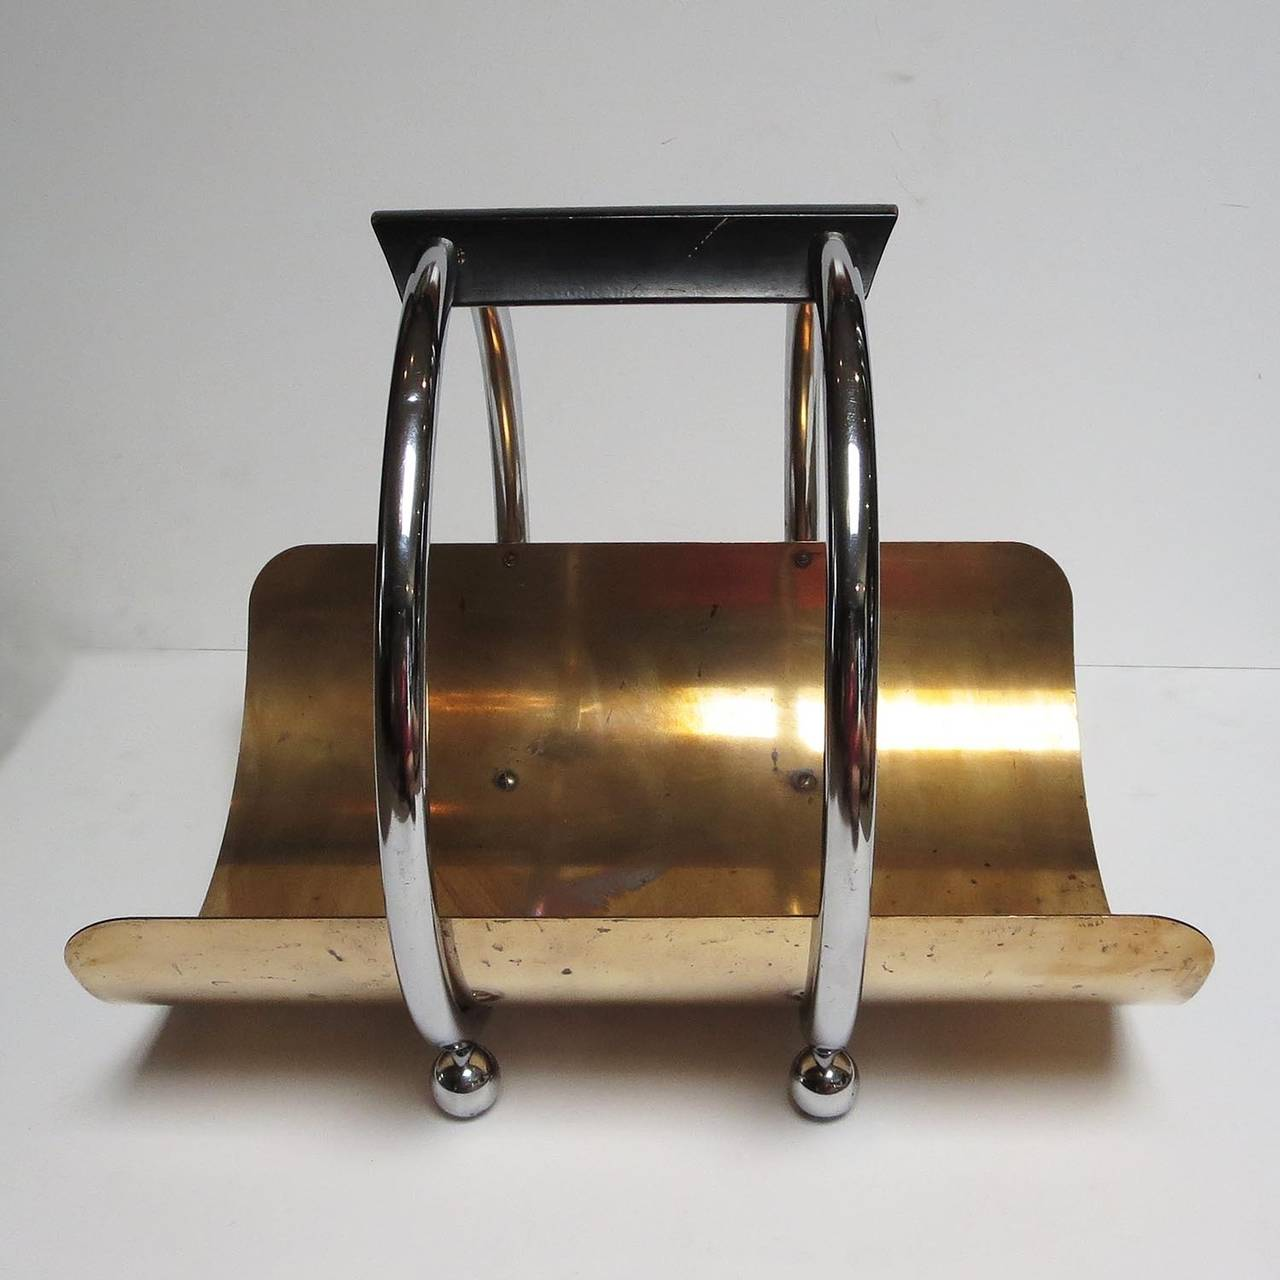 Art Deco Log Basket : Art deco log holder by leslie beaton for revere at